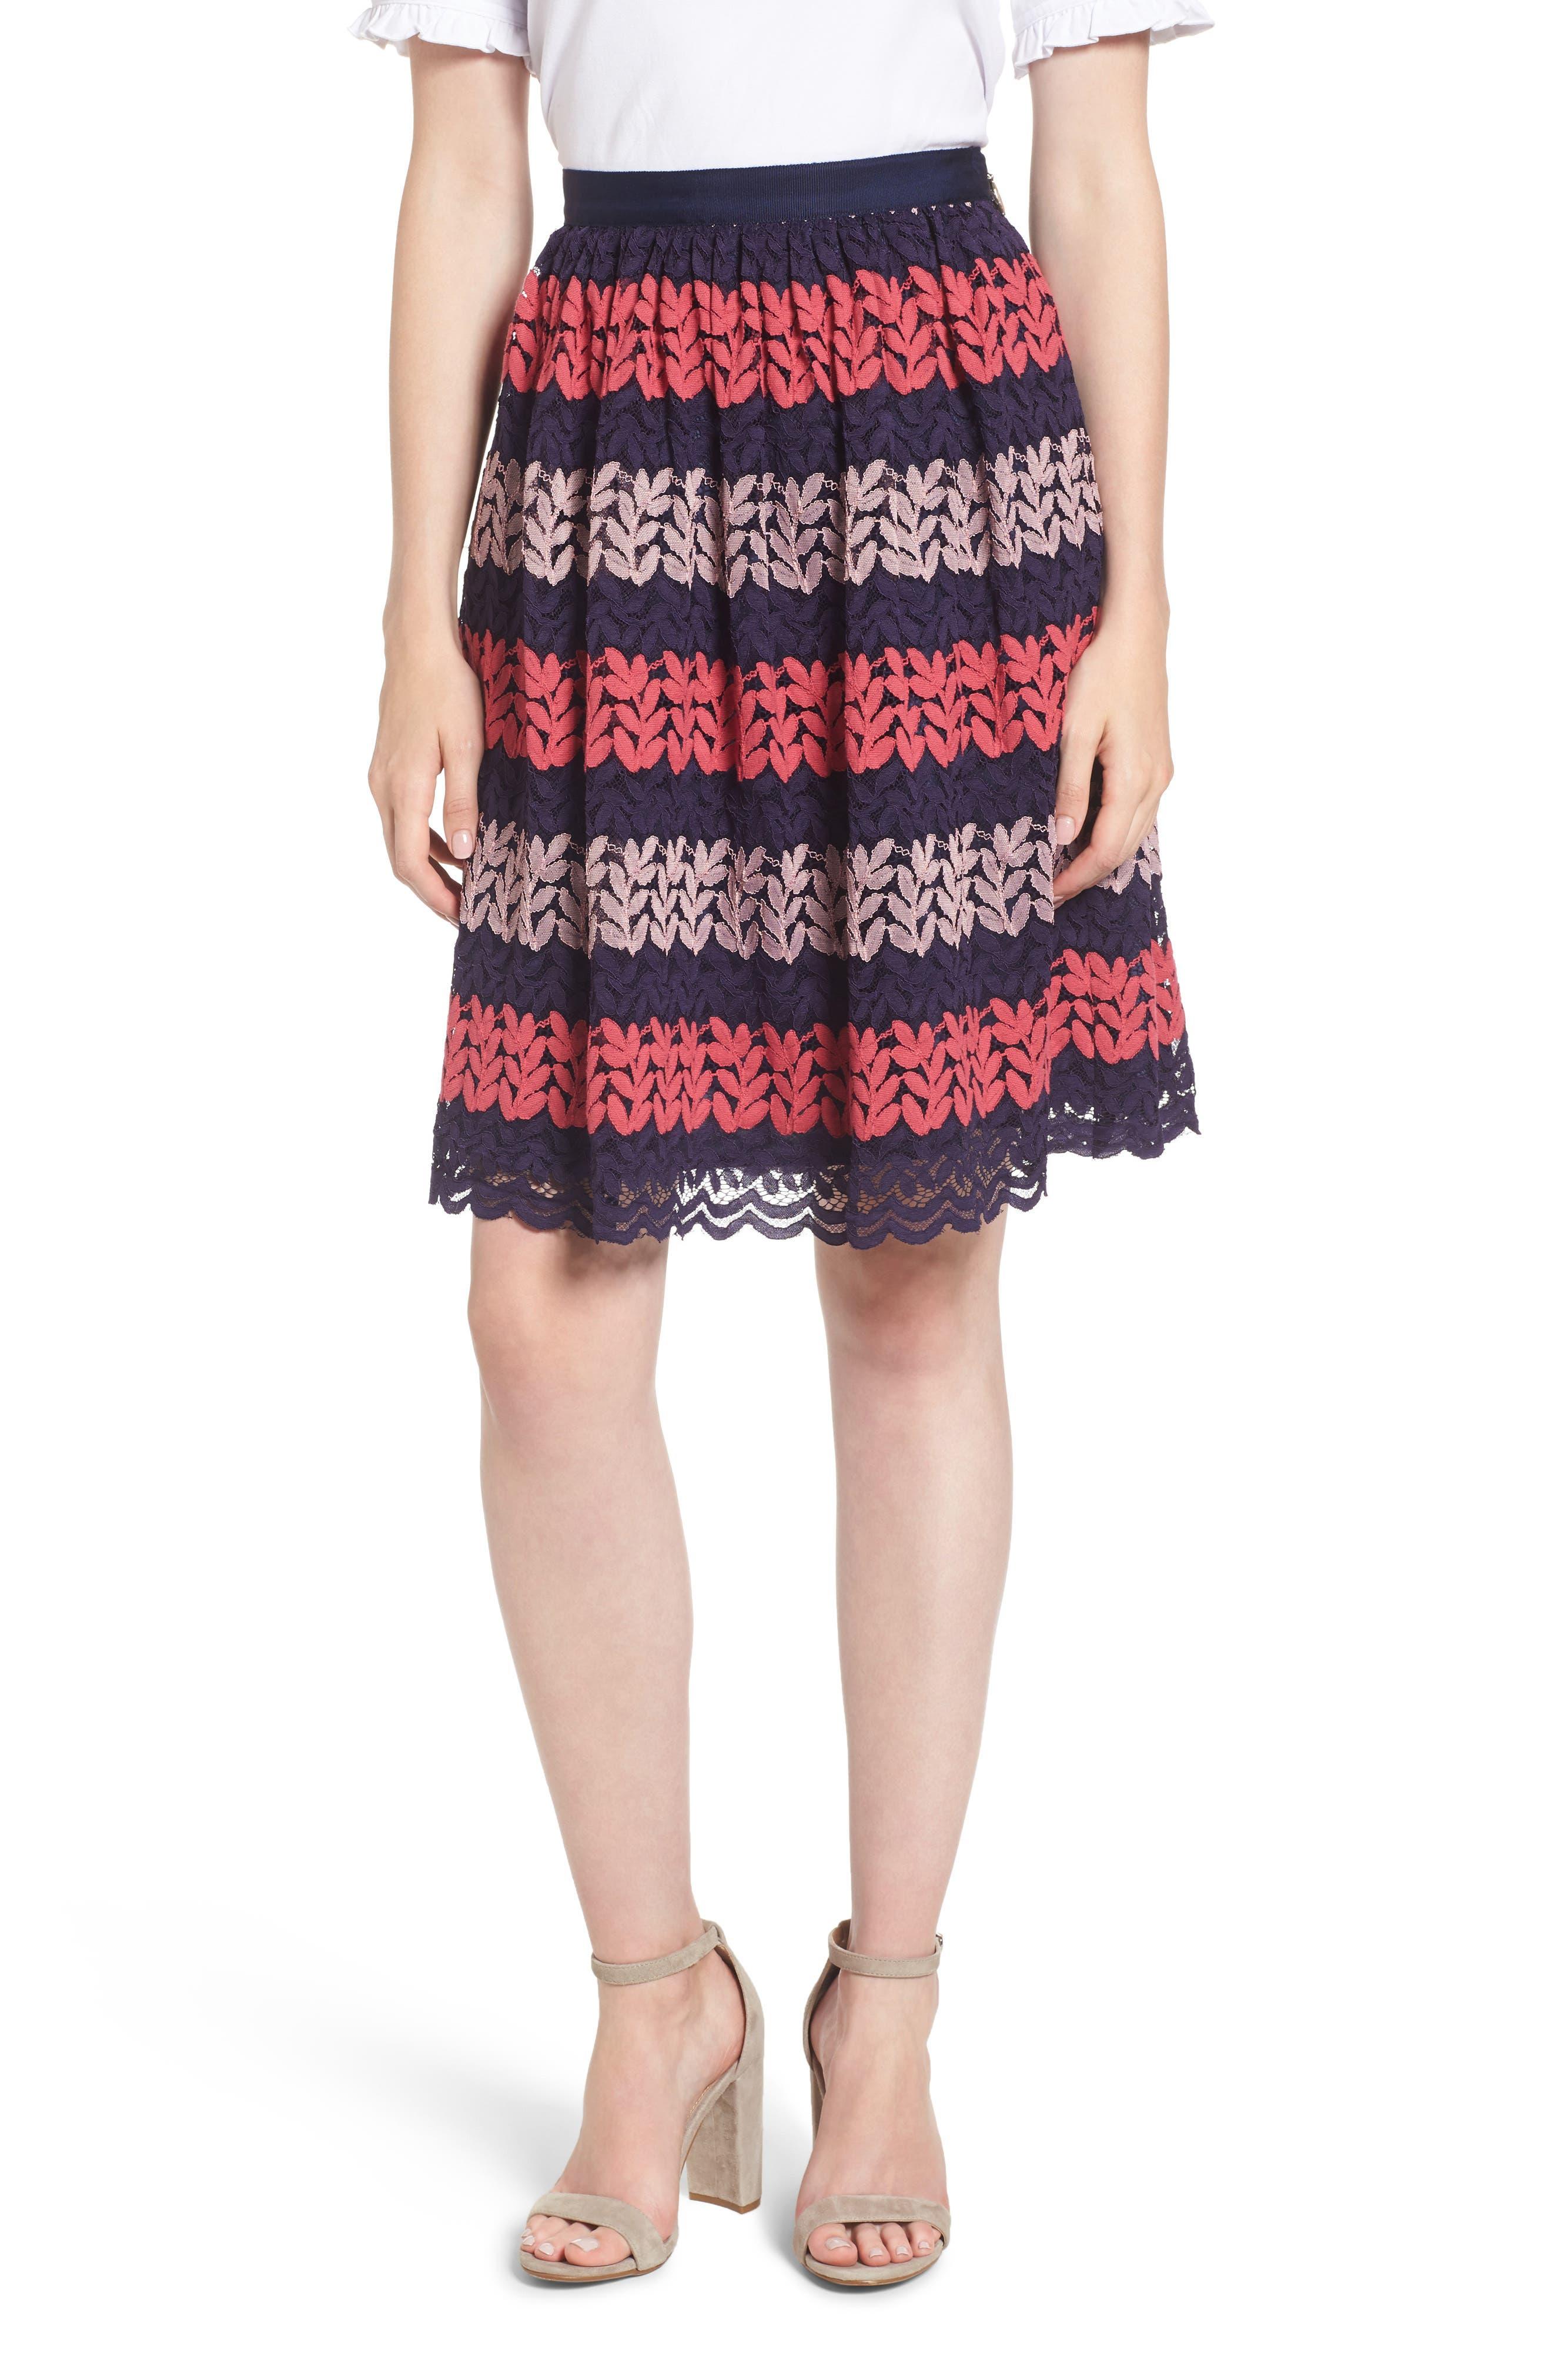 Draper James Ivy Lace Skirt